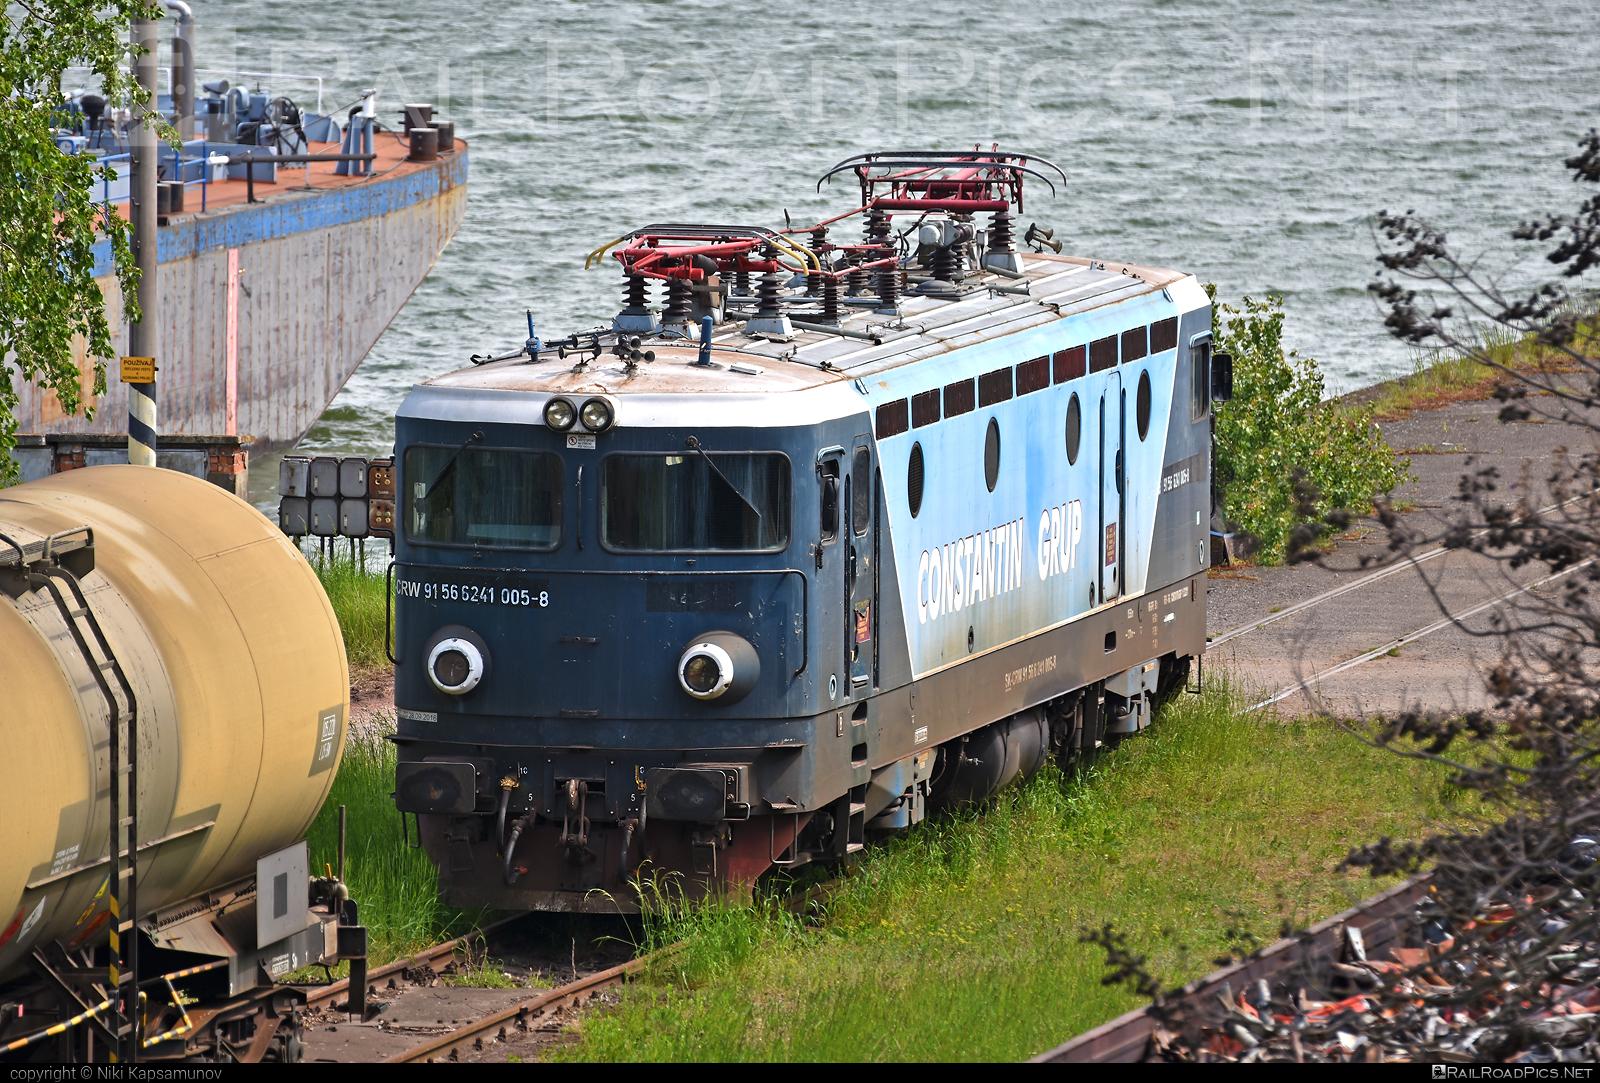 Končar JŽ class 441 - 241 005-8 operated by CENTRAL RAILWAYS s.r.o. #centralrailways #constantingrup #crw #jz441 #koncar #koncar441